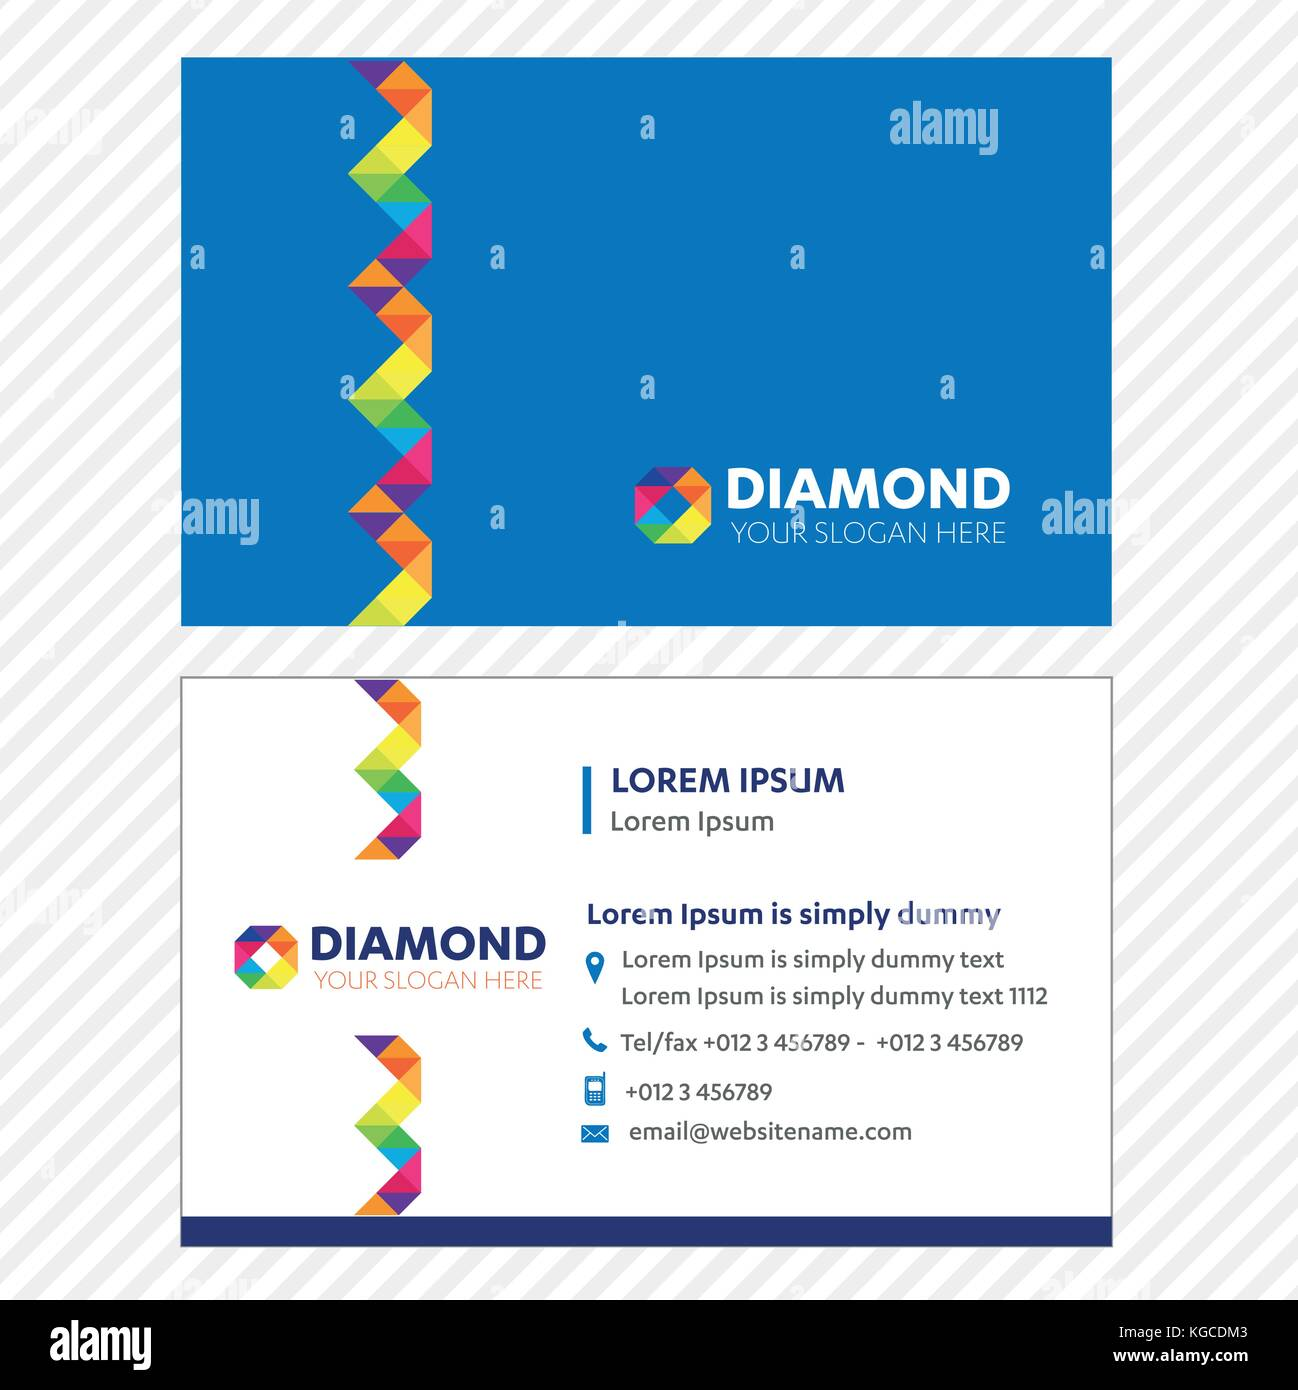 Business card Vector Template, Tech Logo Link Network, Visiting Card ...